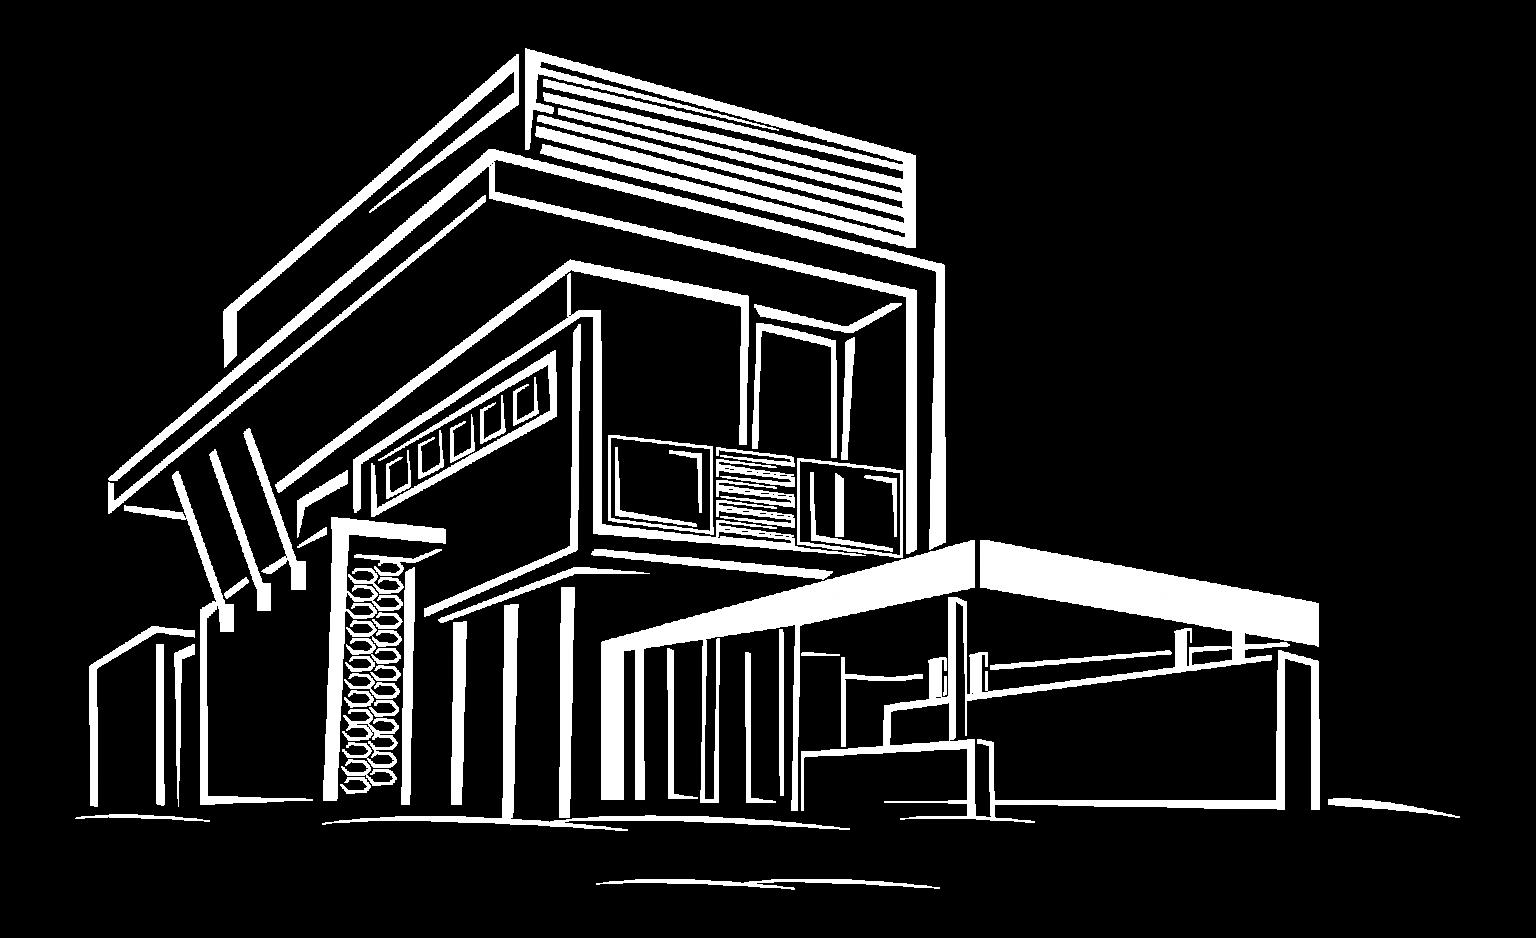 Home-Page-Process-Image-1536x938_3300f02c61bf516da759bfab421c2b0c